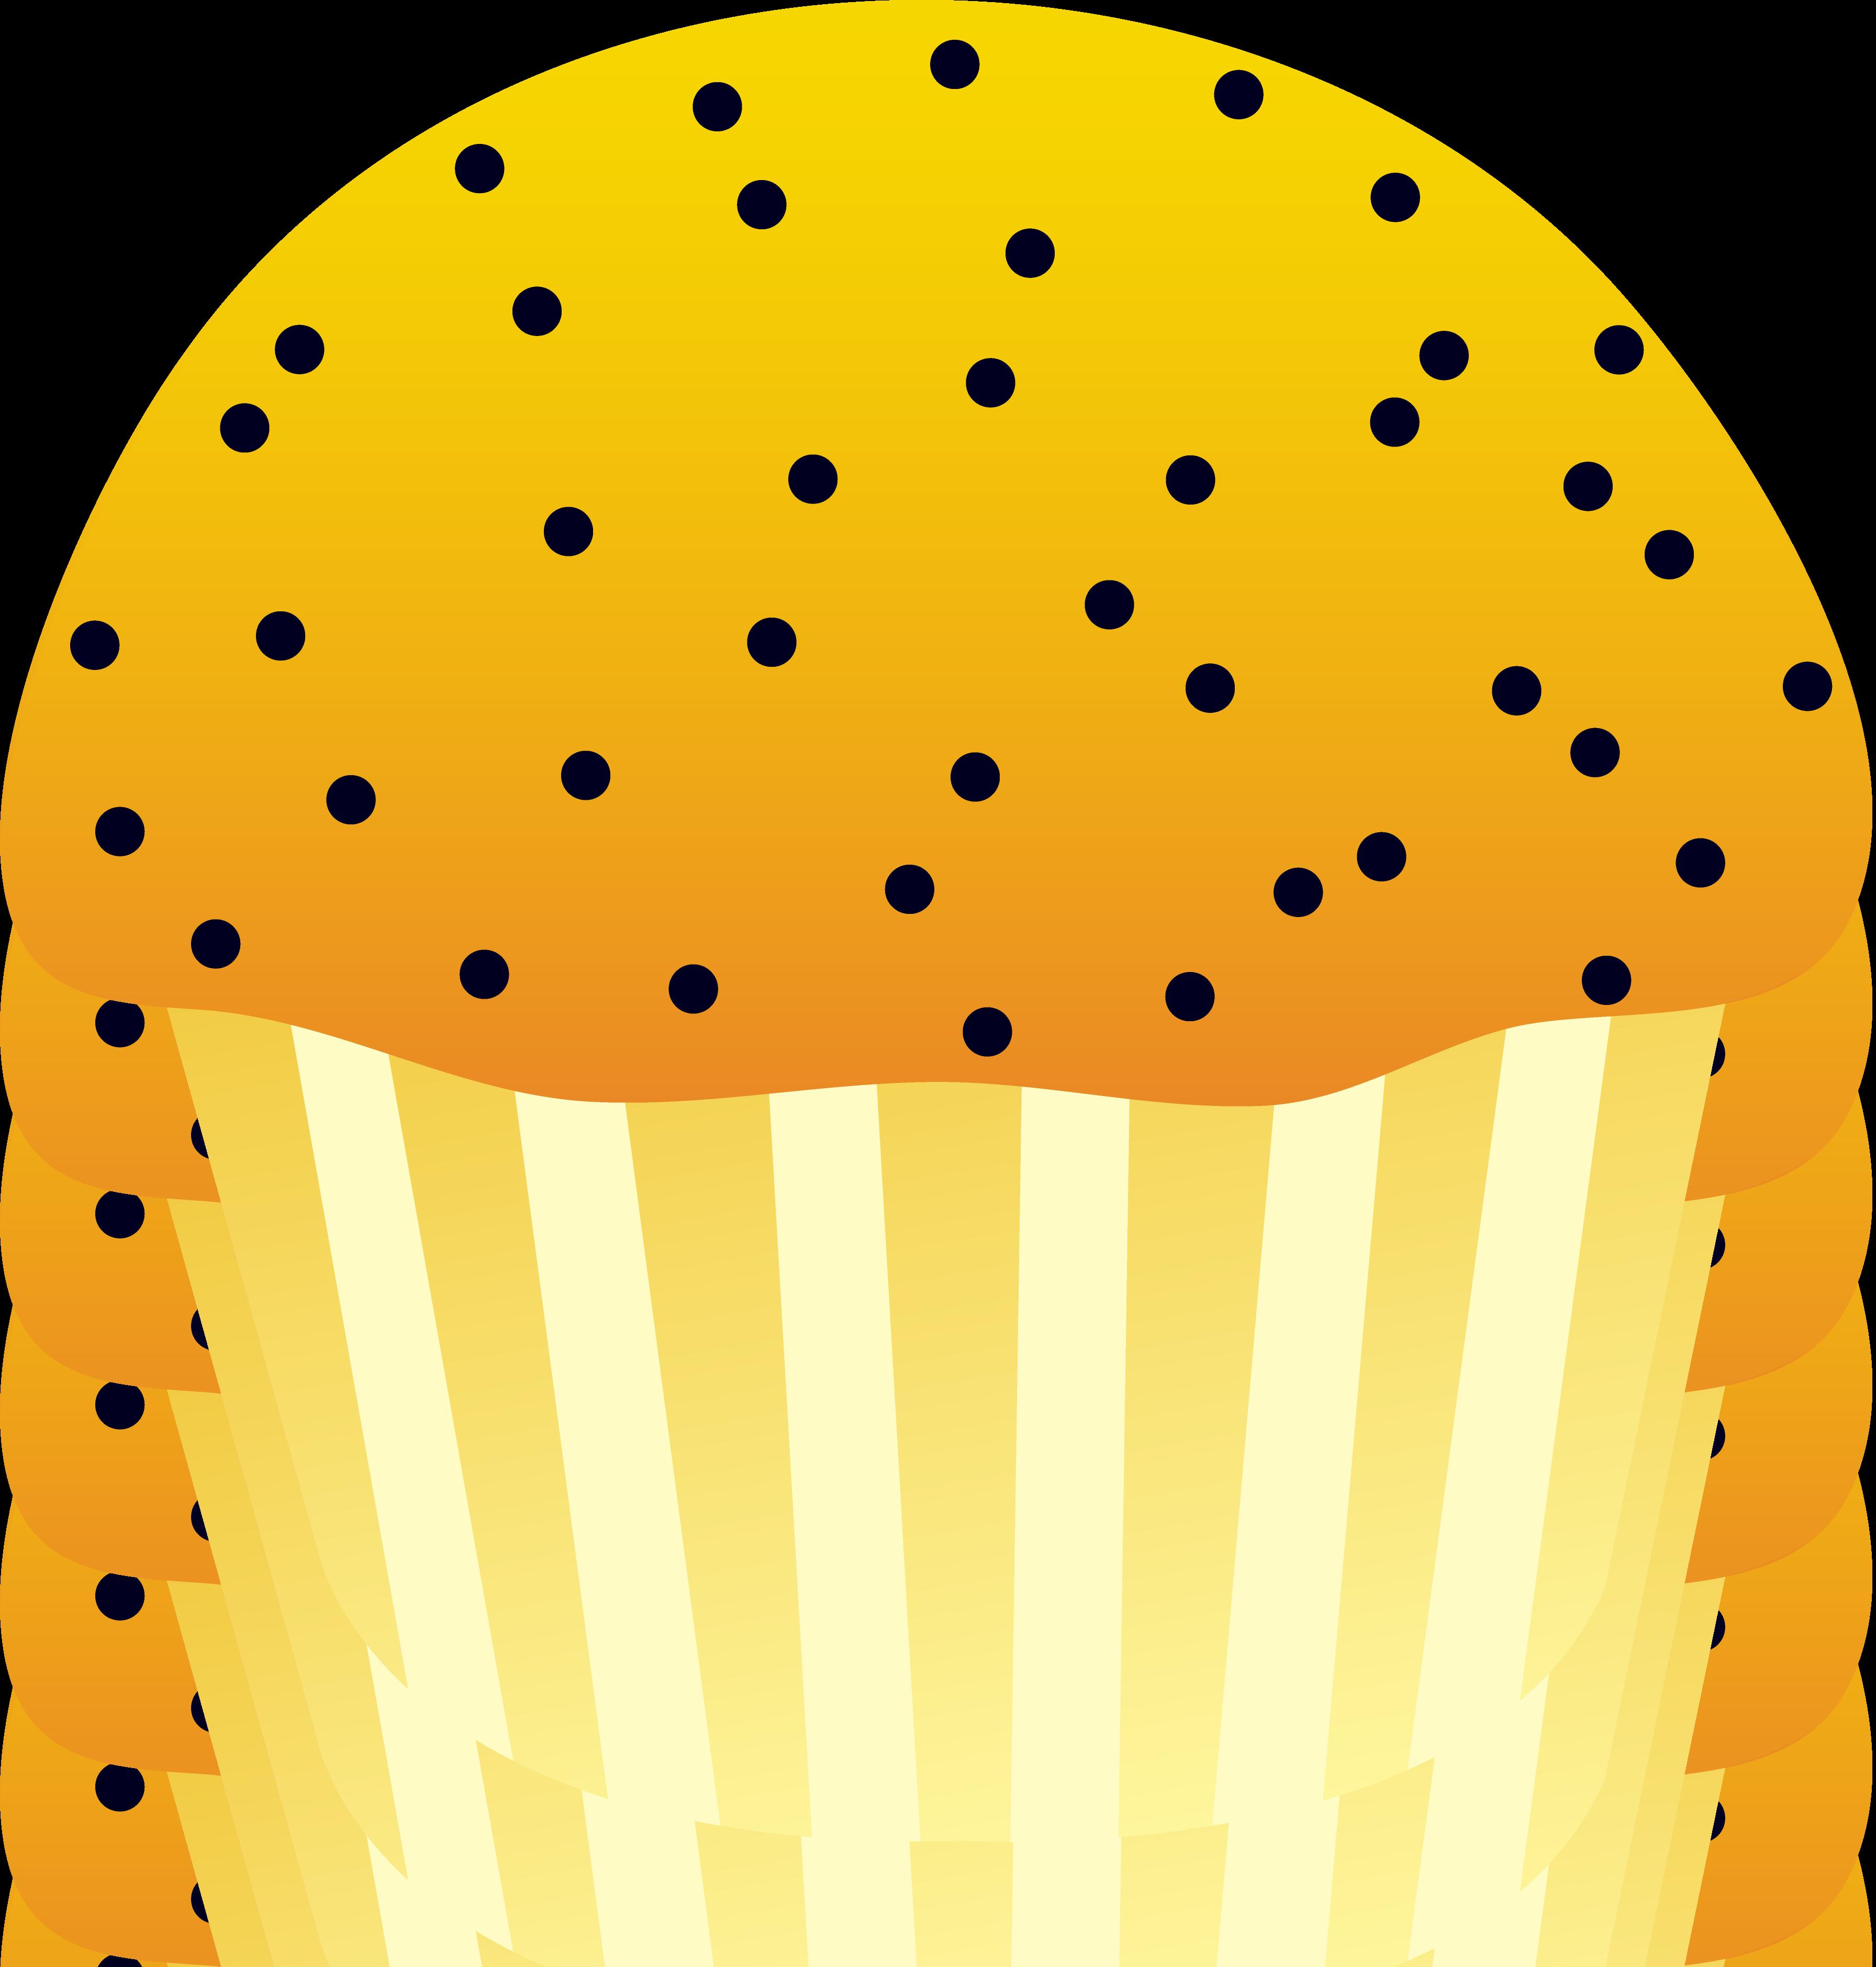 3584x3758 Lemon Poppy Seed Muffin